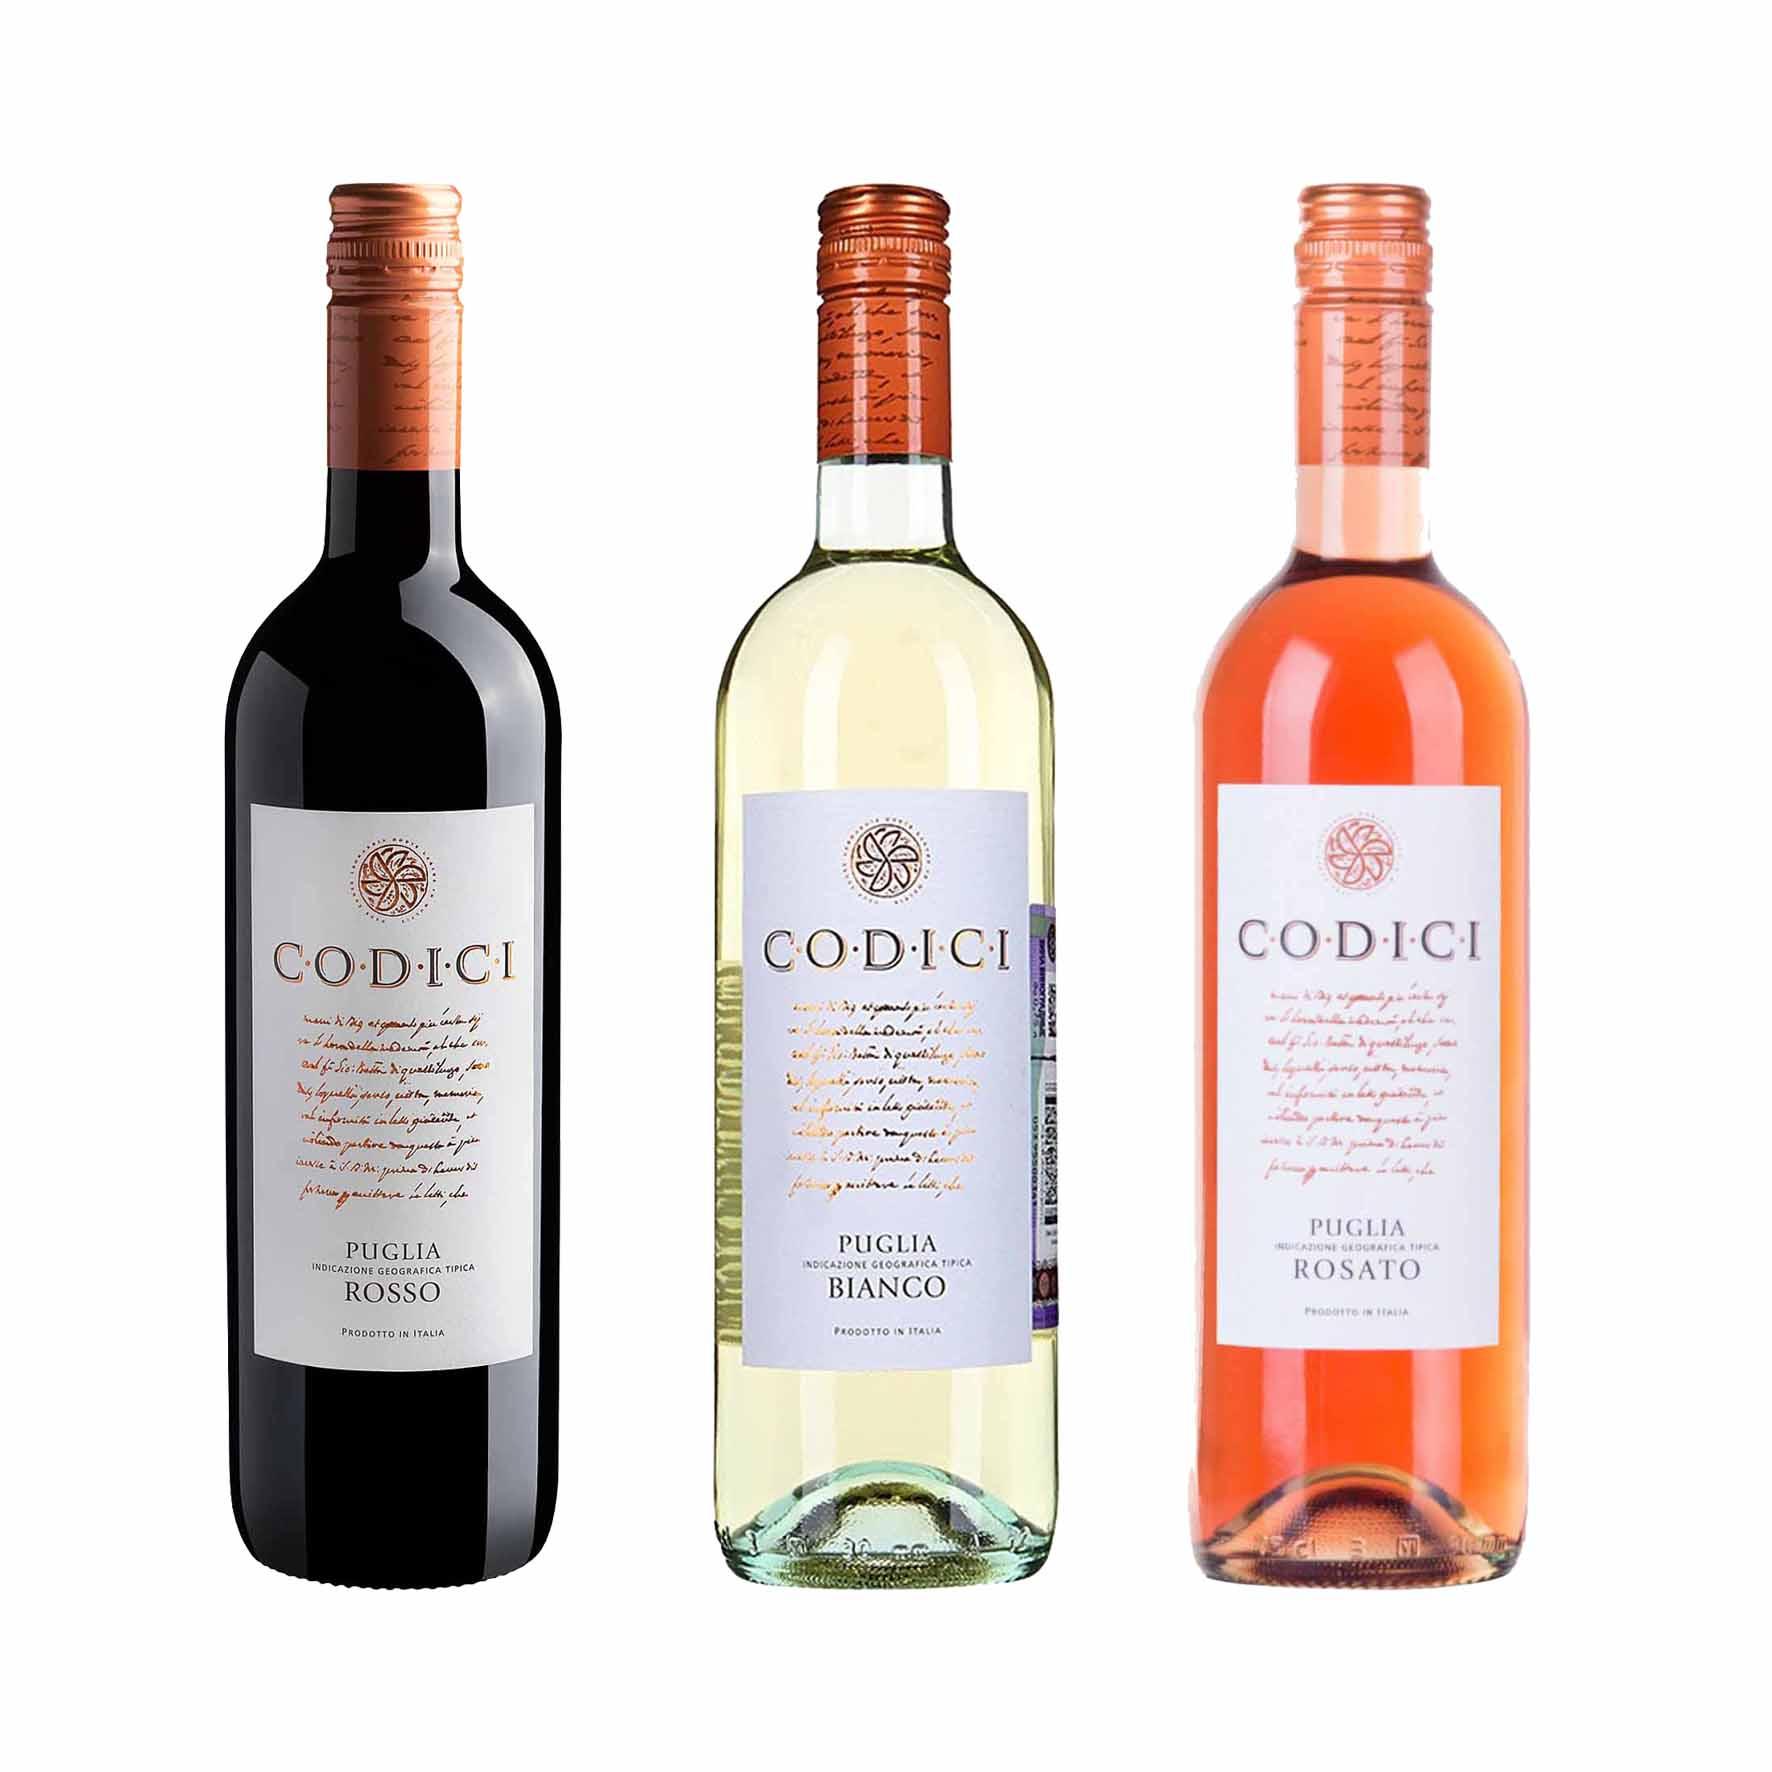 Kit 3x Vinho Italiano Tinto/Branco/Rosé Codici Rosso/Bianco/Rosato Puglia IGT